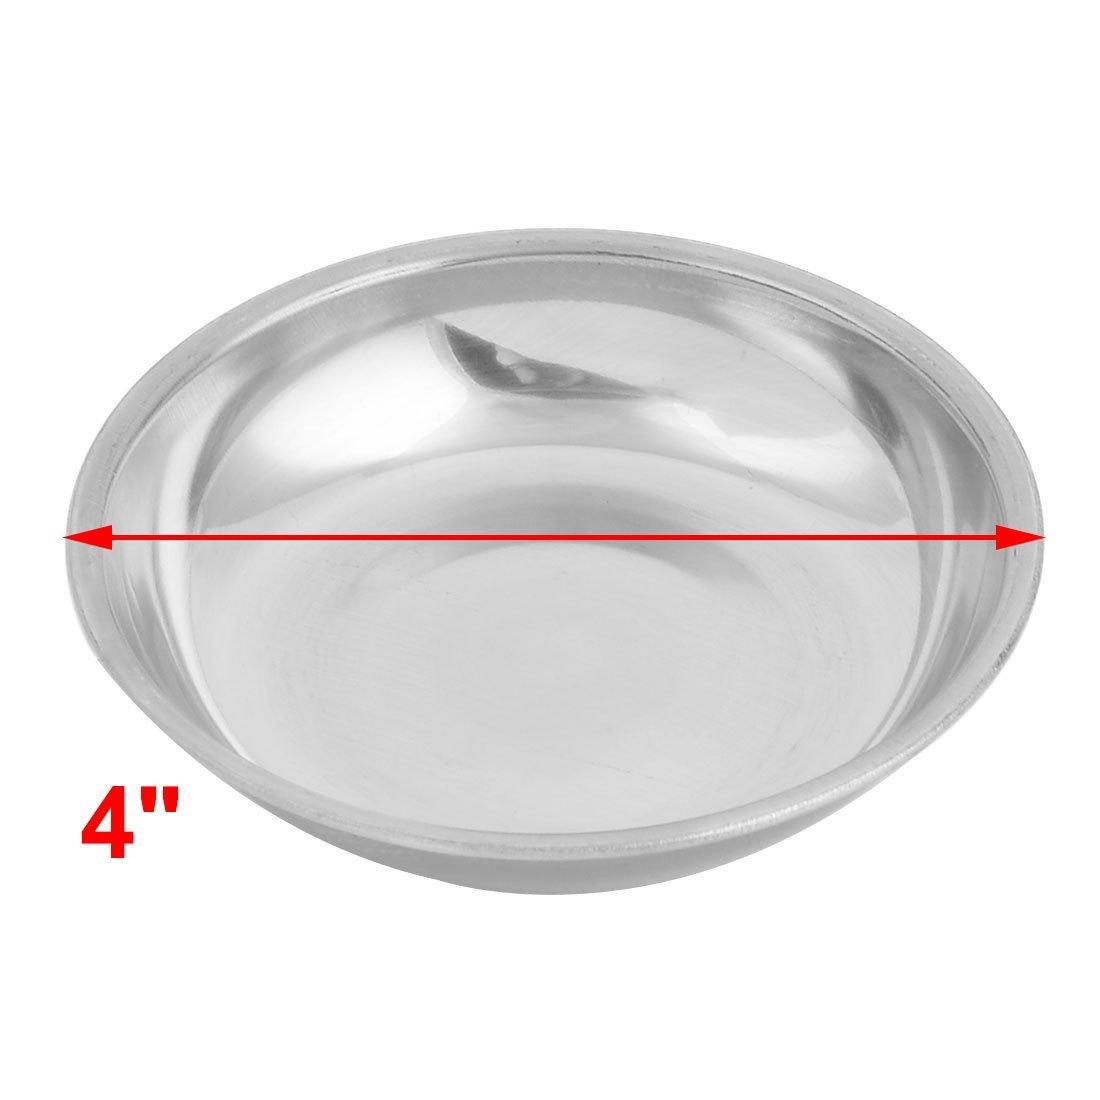 Amazon.com | eDealMax acero inoxidable cocina casera de platos de salsa de sal Placa 10cm 4pcs Dia tono de plata: Accent Plates